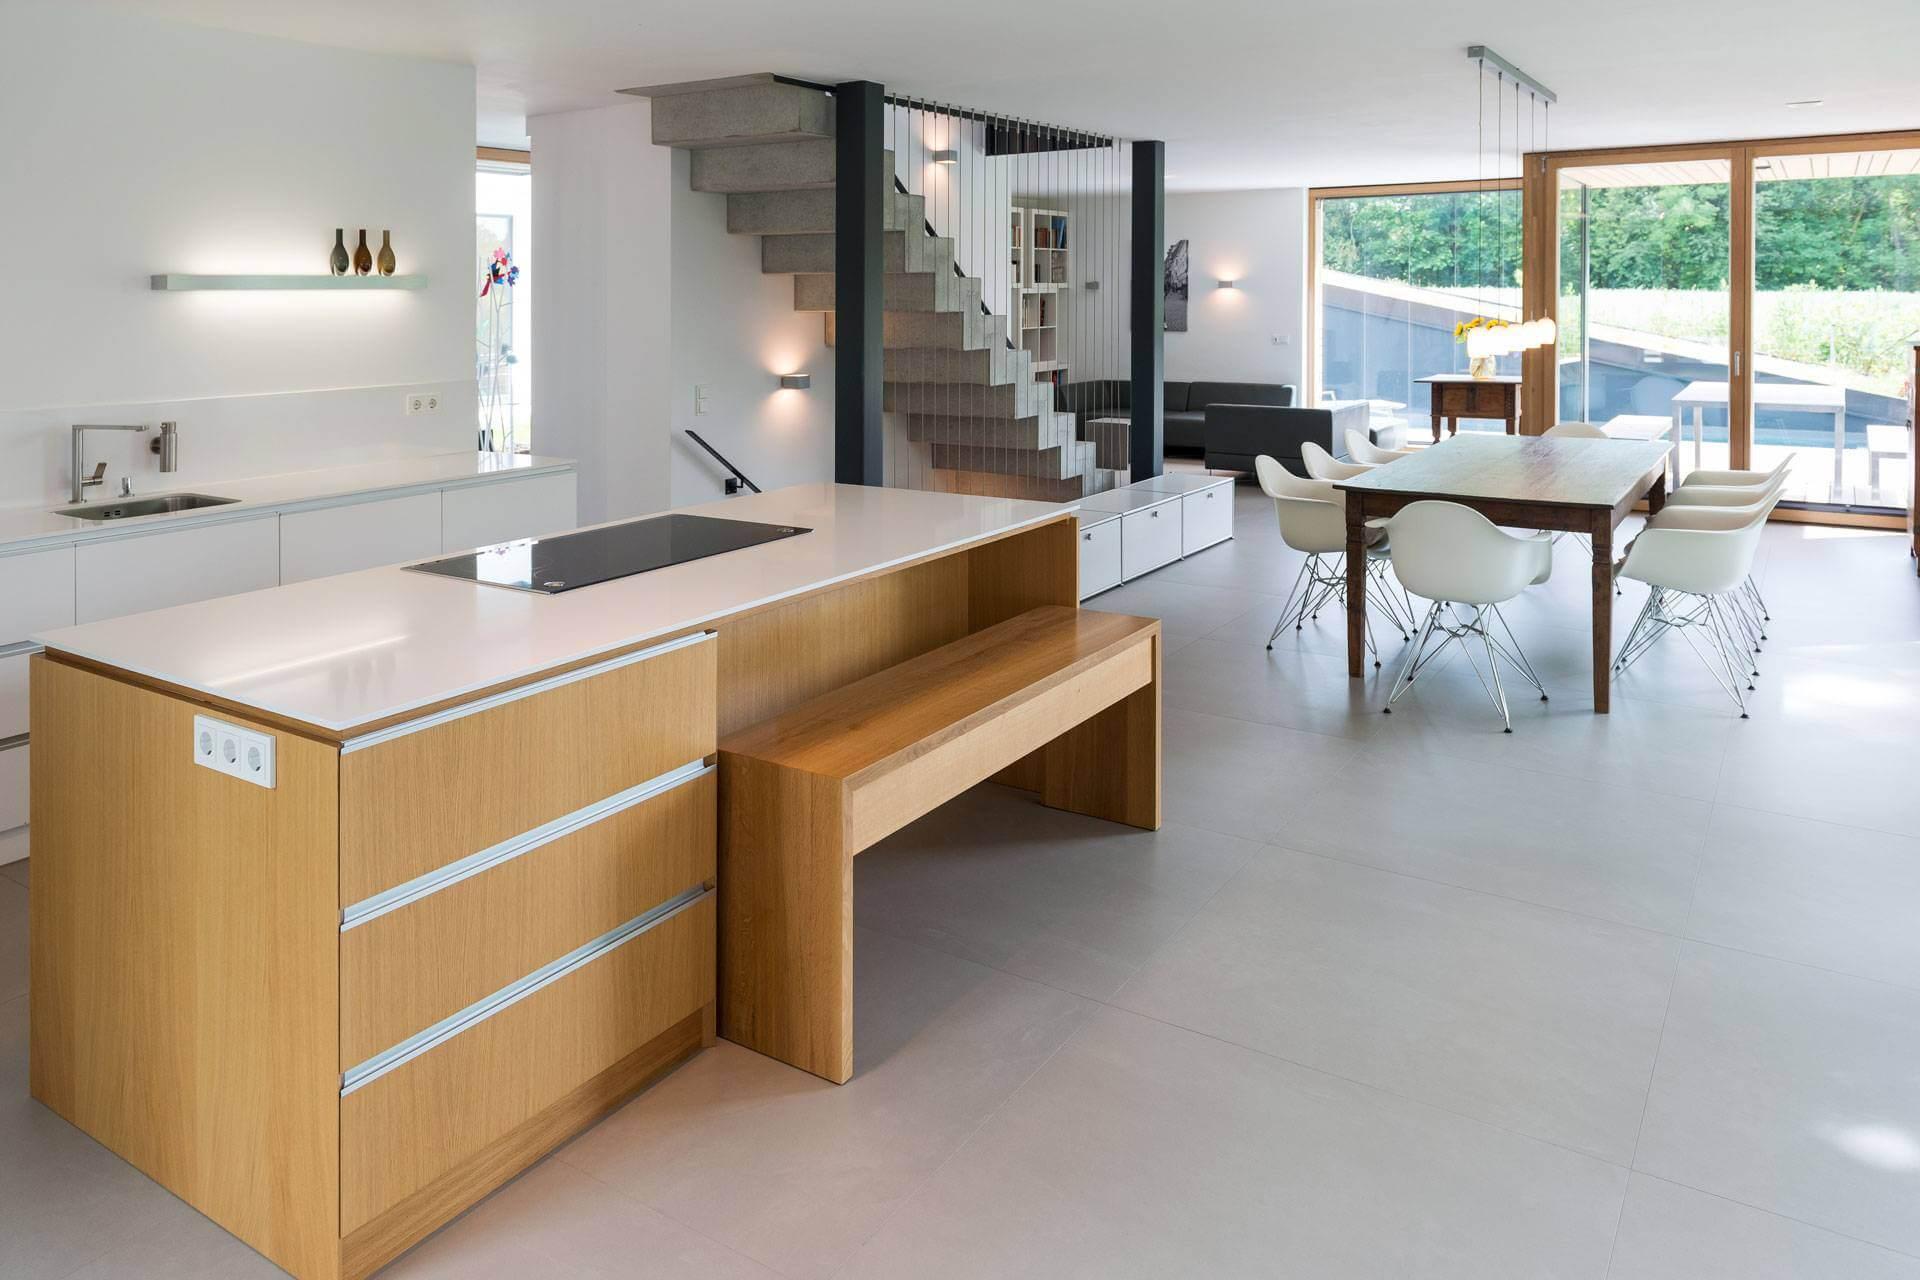 modern-house-despang-schlpmann-architekten-09